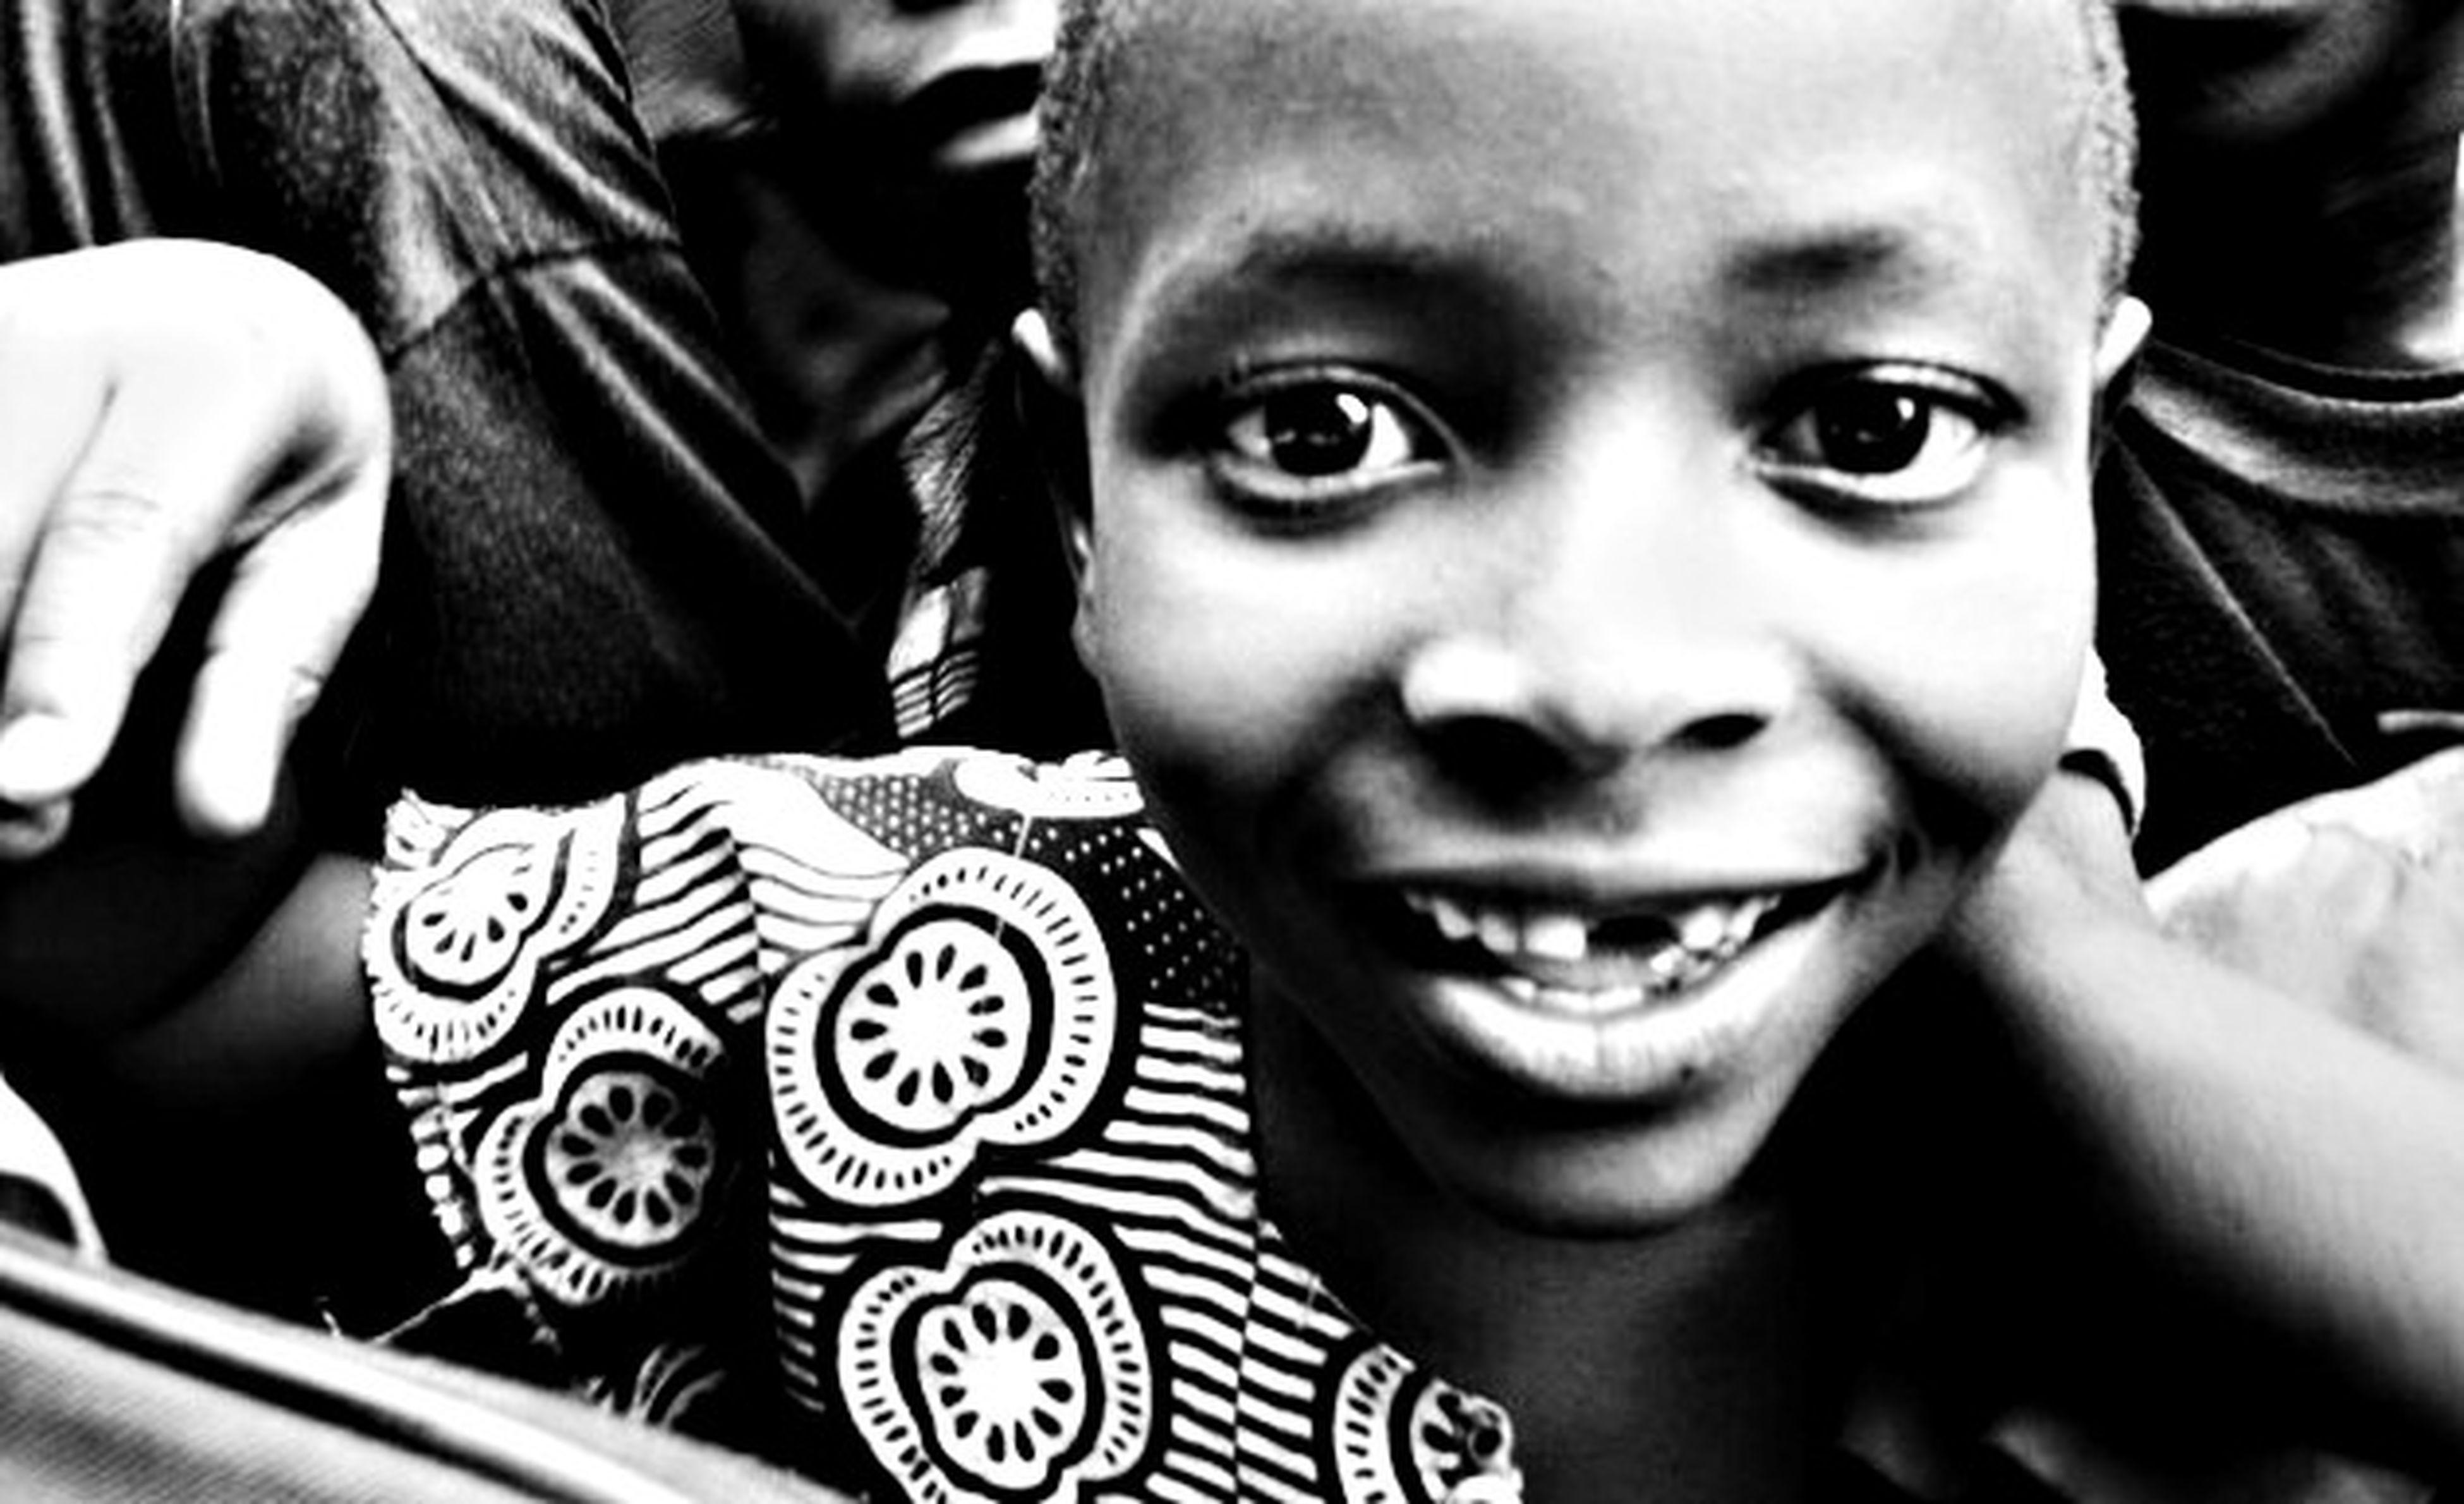 The Explorer - 2014 EyeEm Awards TogoWestAfrica Faces TrueHappiness